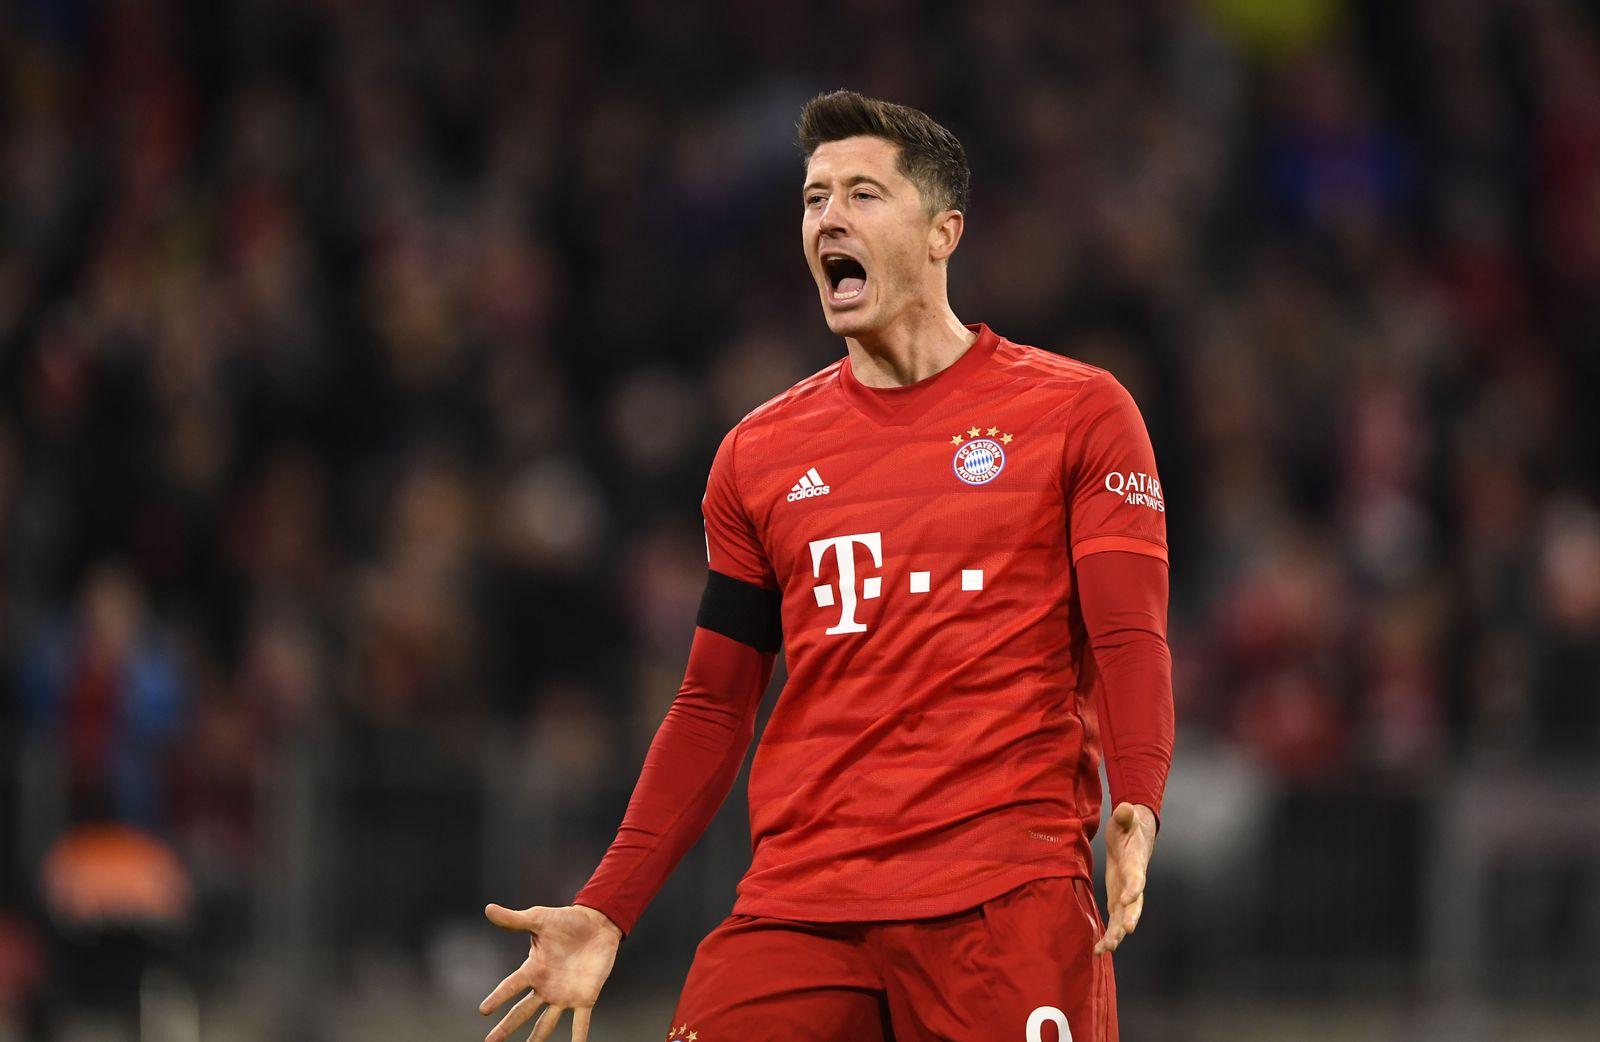 FC Bayern Munich vs SC Paderborn, Germany - 21 Feb 2020